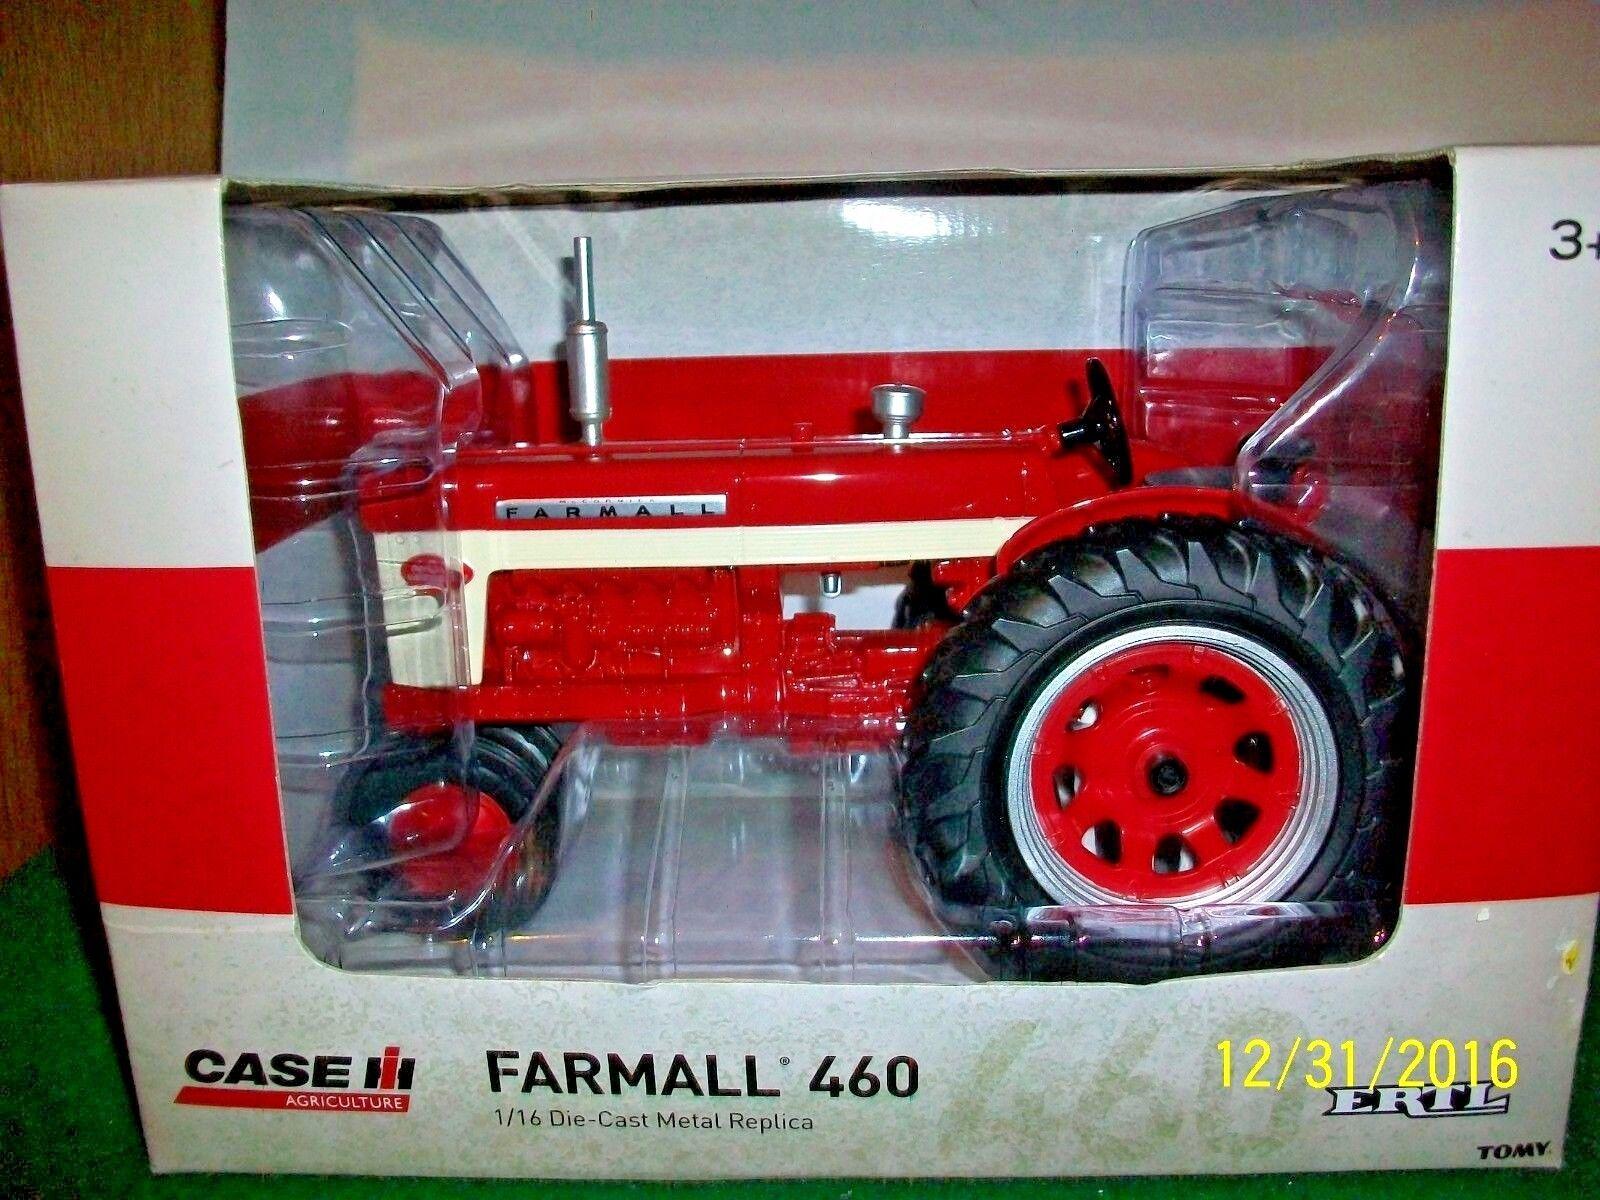 2016 Tractor Case IH Farmall 460 Ertl Escala 1 16